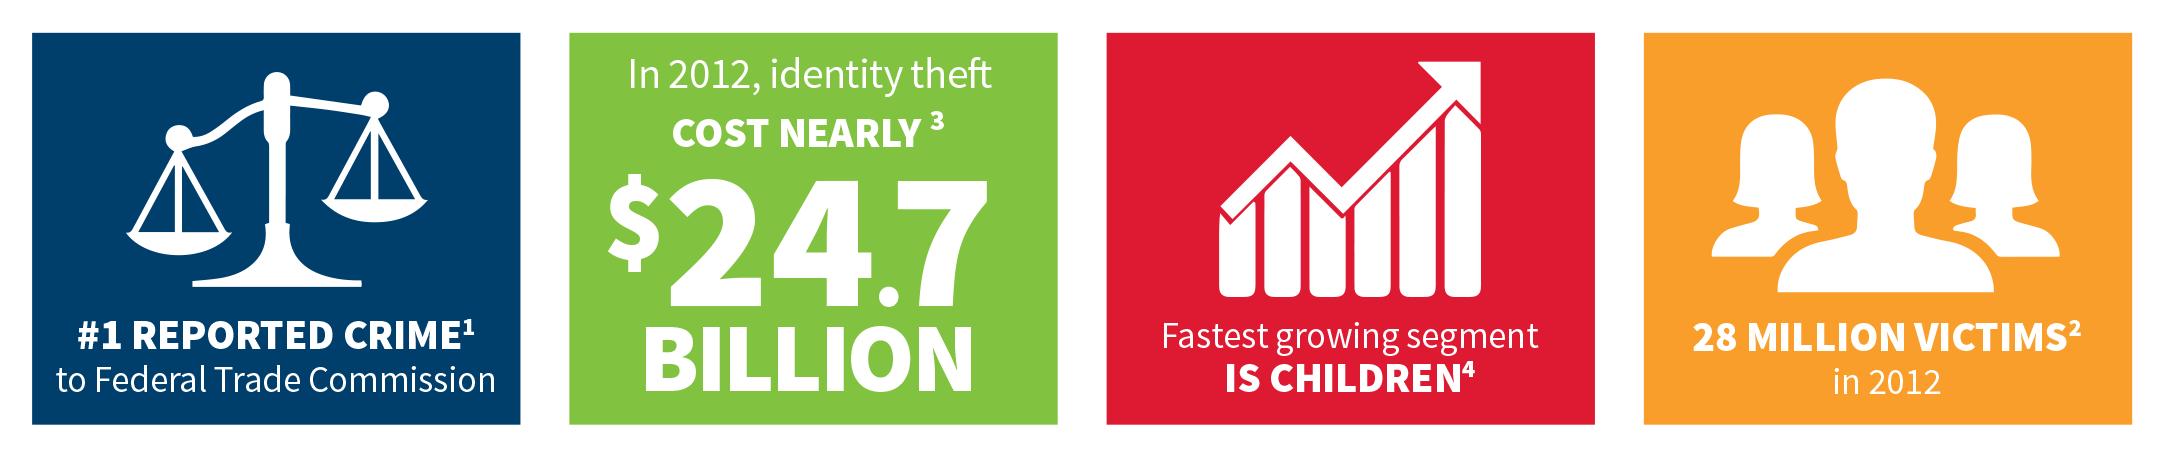 The Impact of Identity Theft